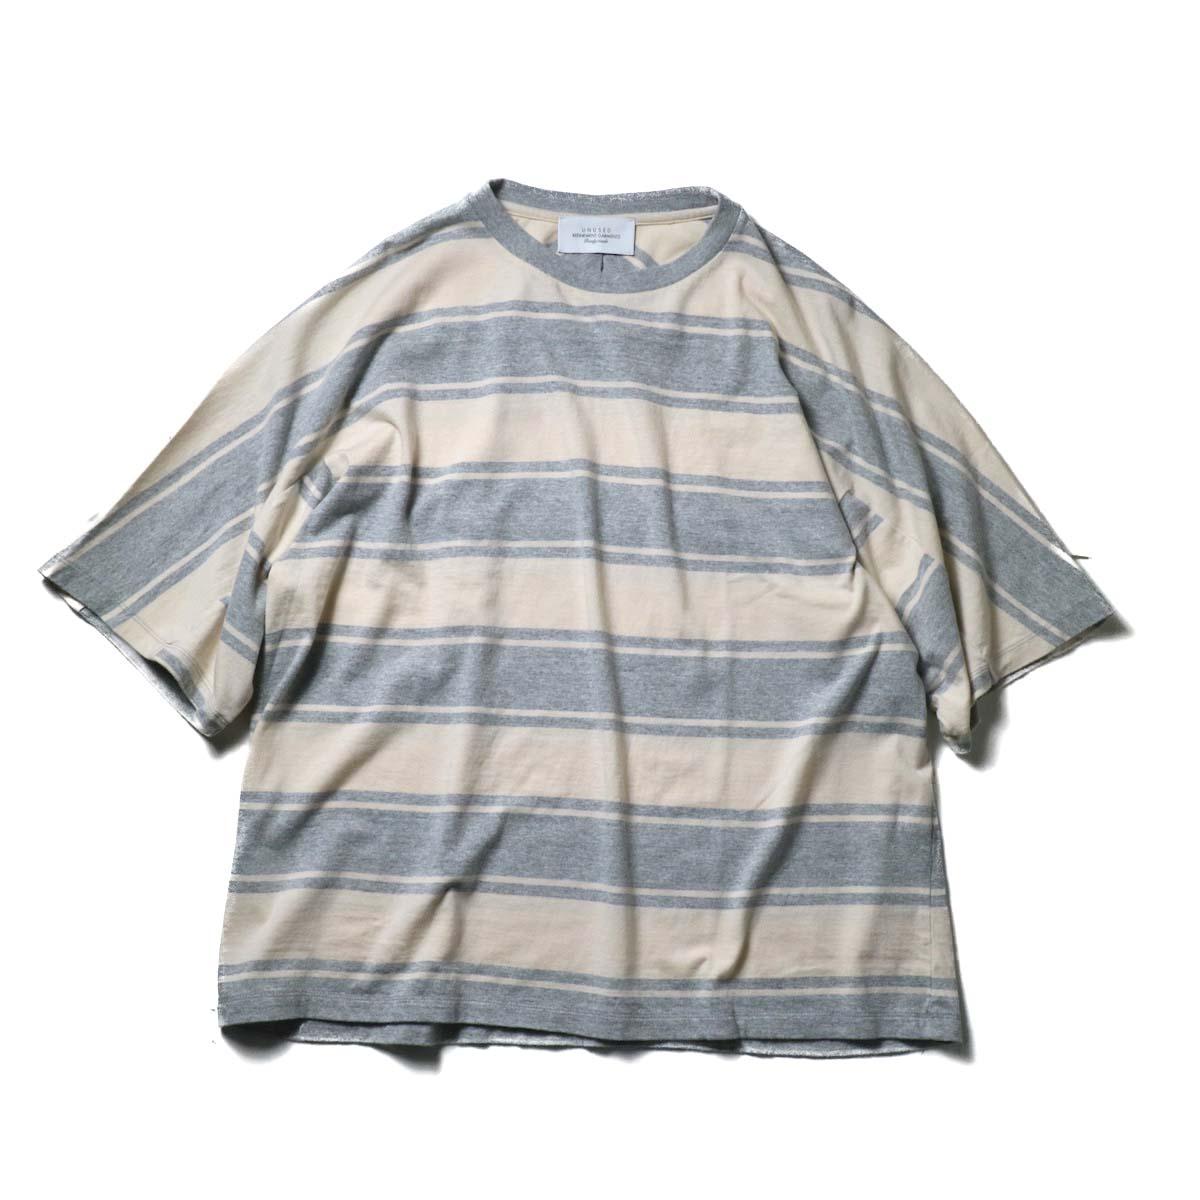 UNUSED / US1951 Dolman sleeve Short sleeve t-shirt (Gray × Beige)